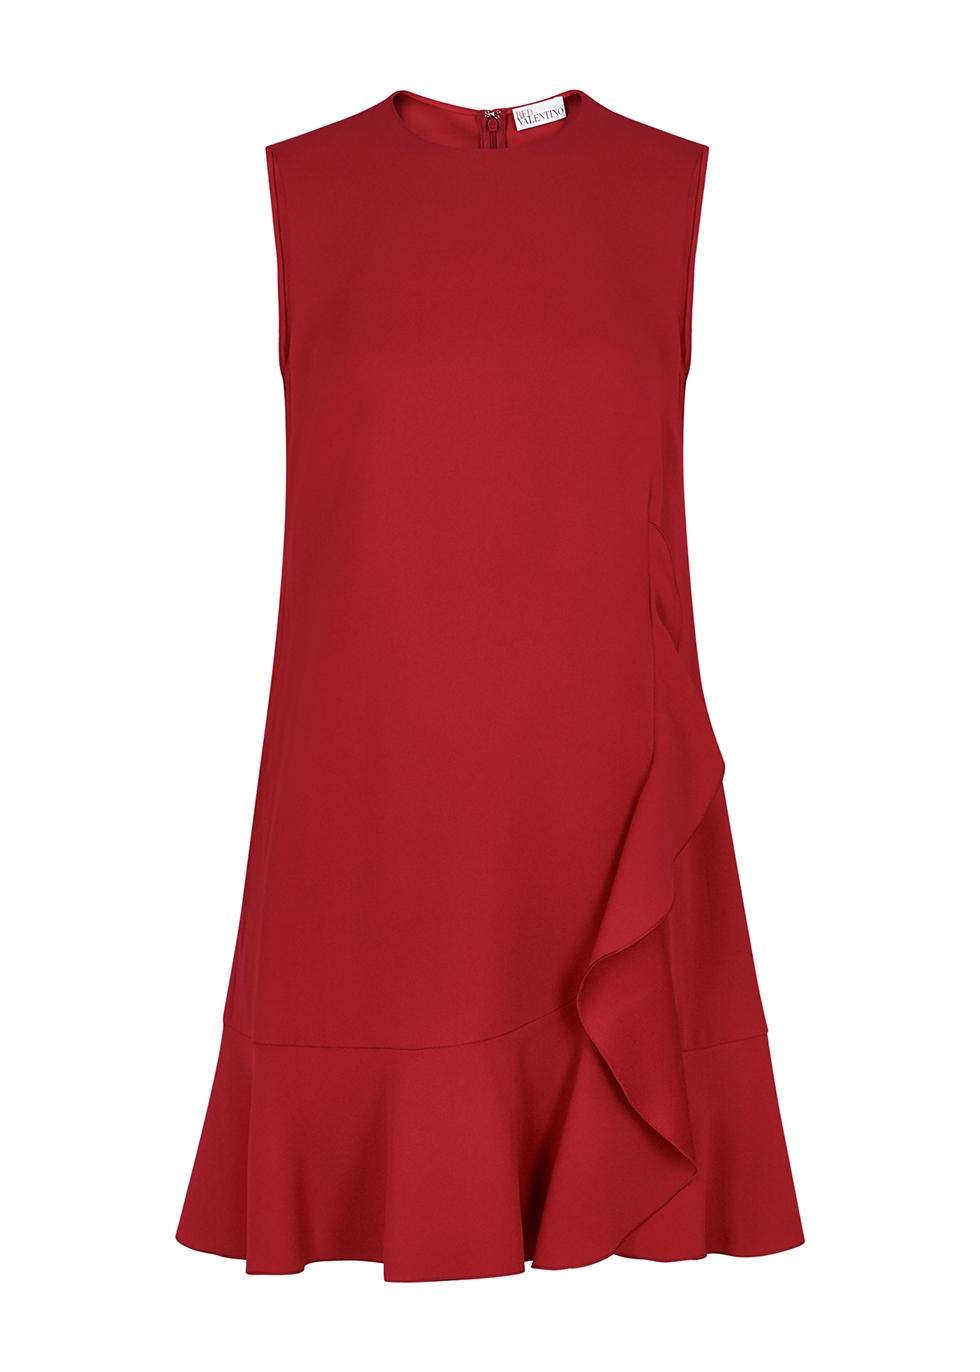 Red ruffle-trimmed mini dress